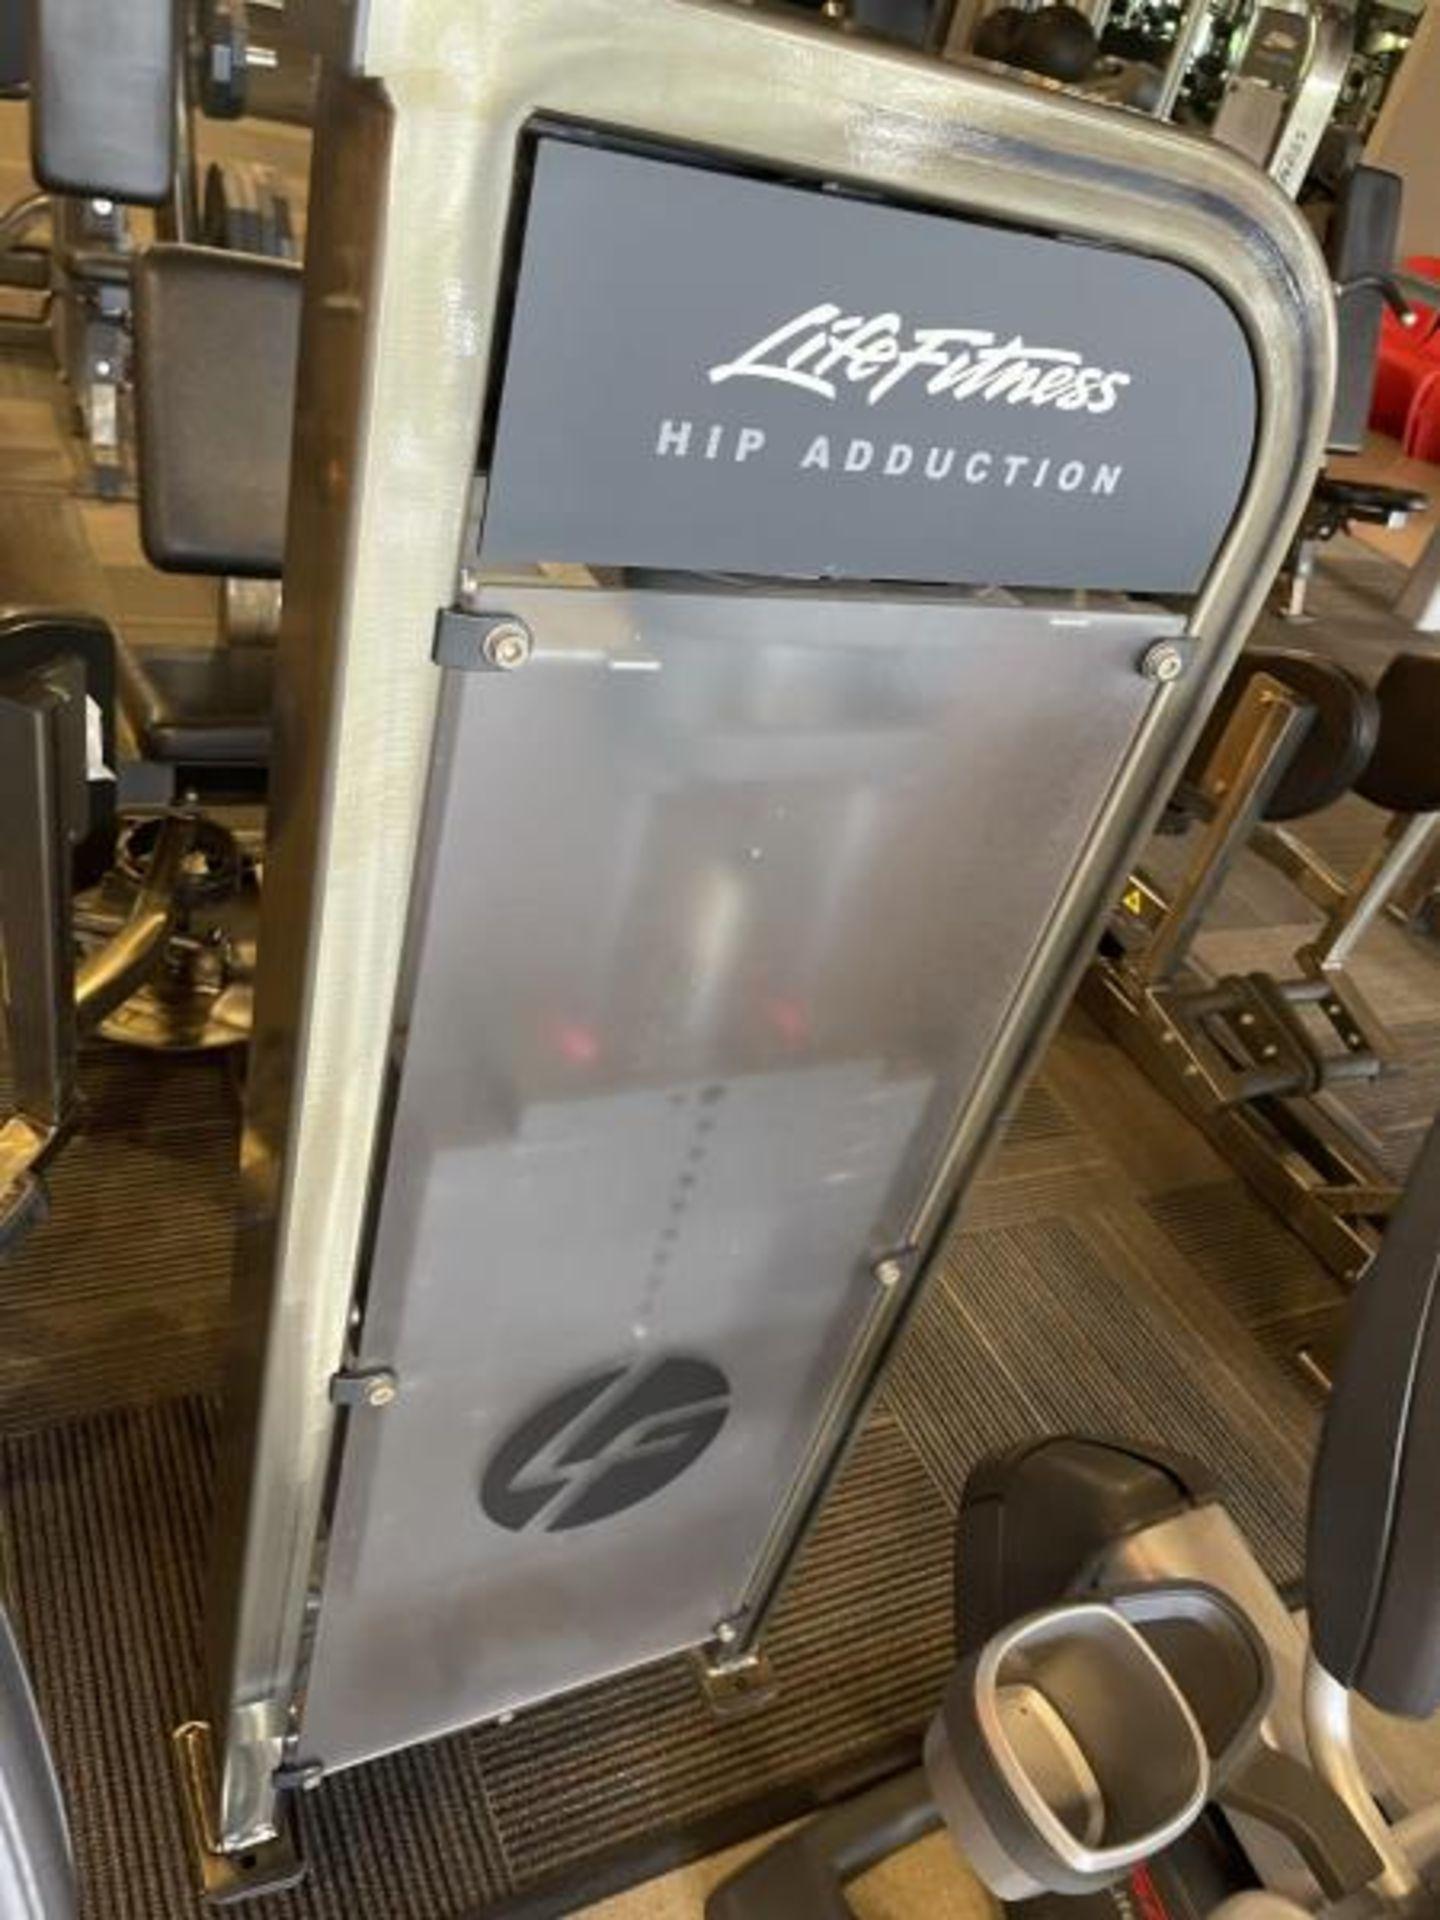 Life Fitness Hip Adduction M: PSHADSE - Image 4 of 5